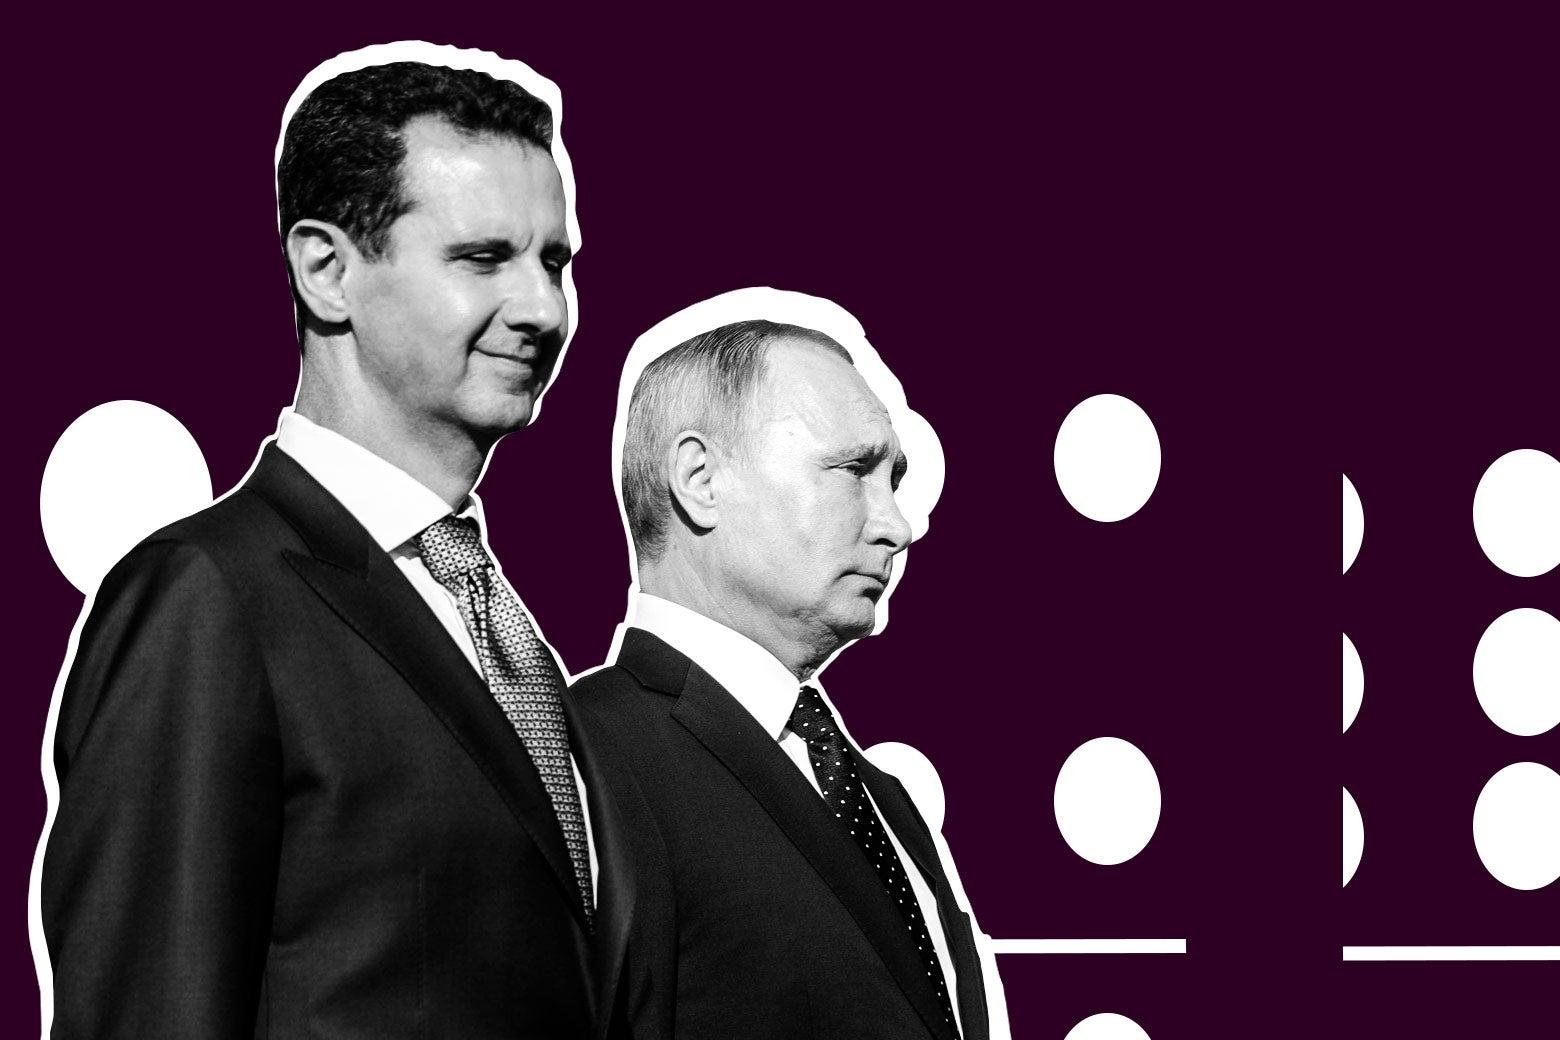 Syrian President Bashar al-Assad and Russian President Vladimir Putin.